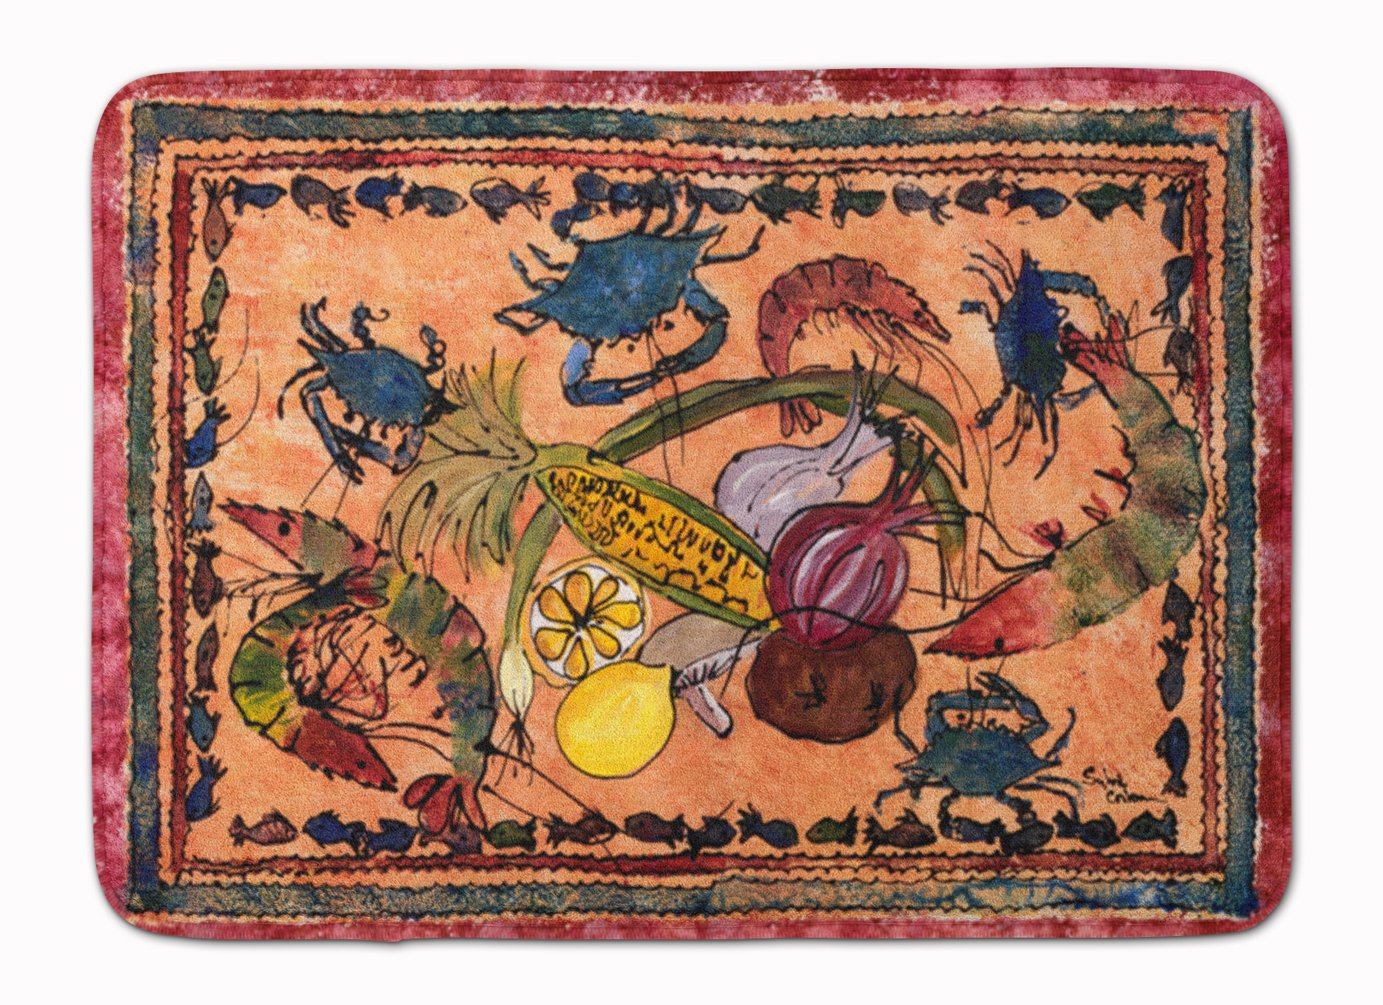 Carolines Treasures Crab Floor Mat 19 x 27 Multicolor